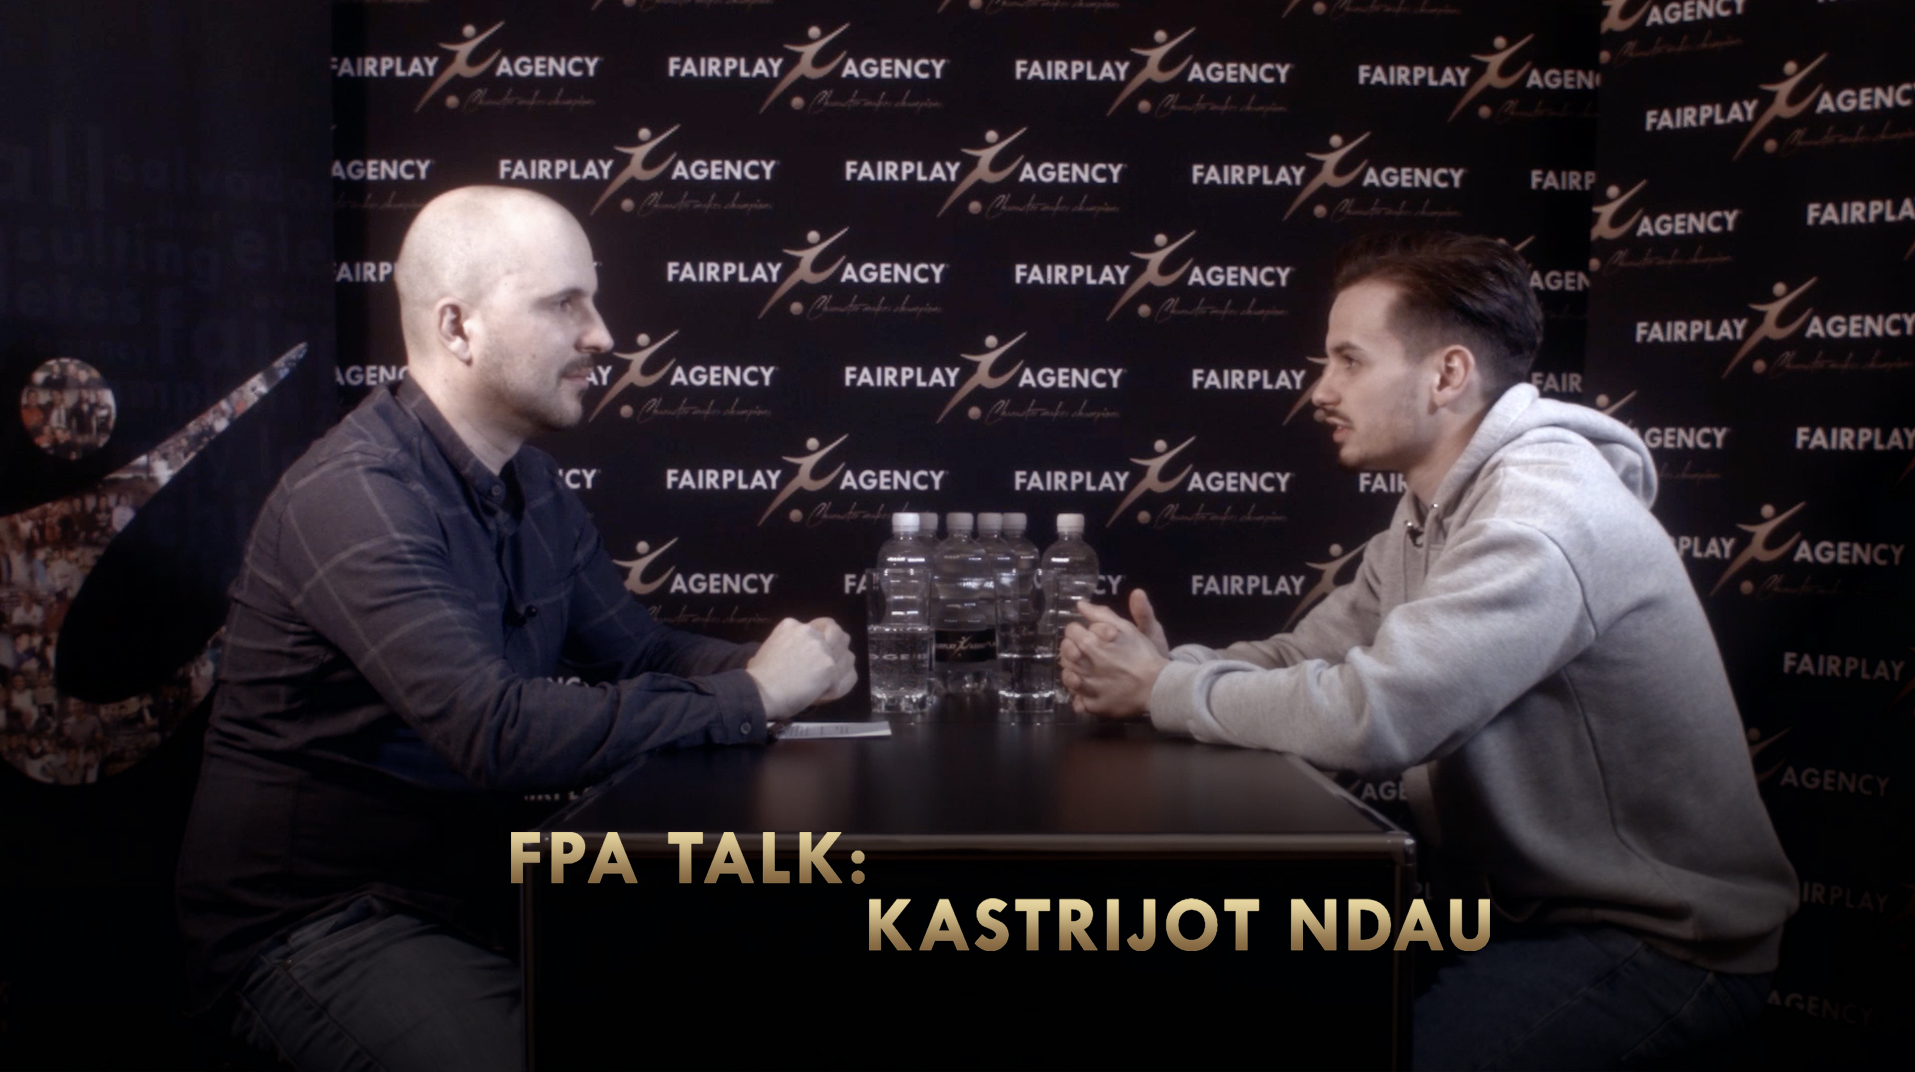 FPA TALK: Kastrijot Ndau